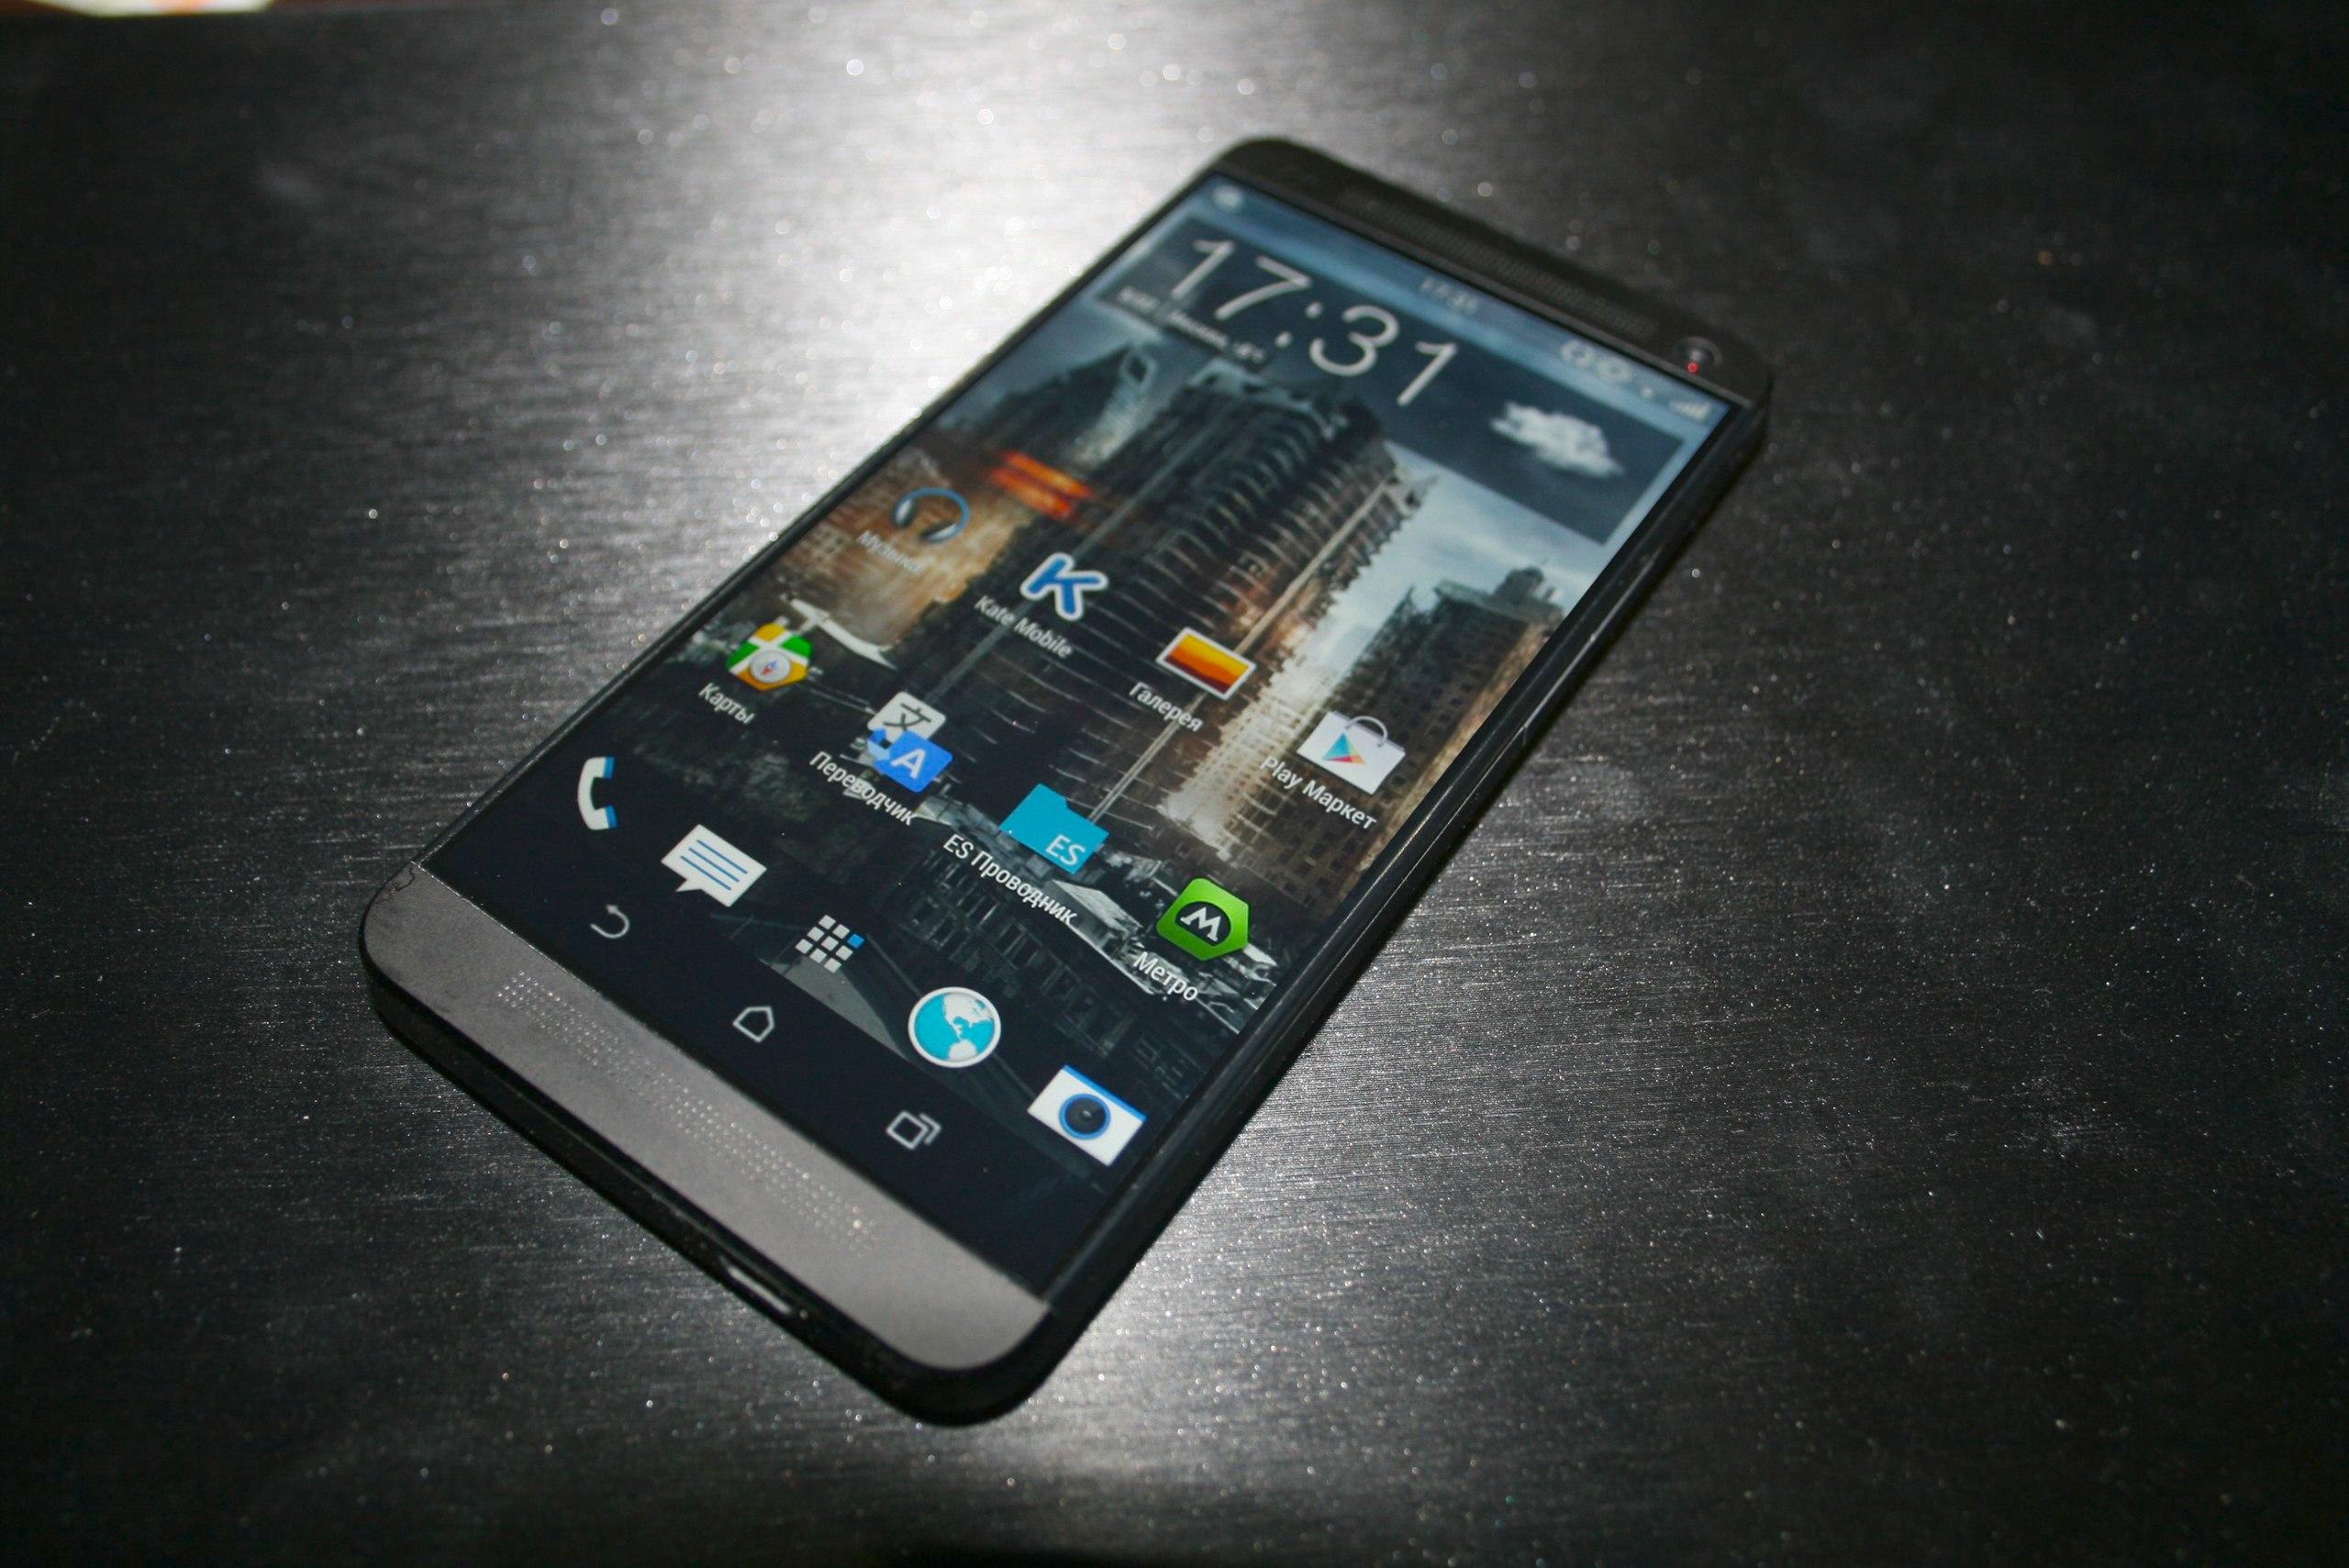 HTC-One-Plus-M8-front-2.jpg